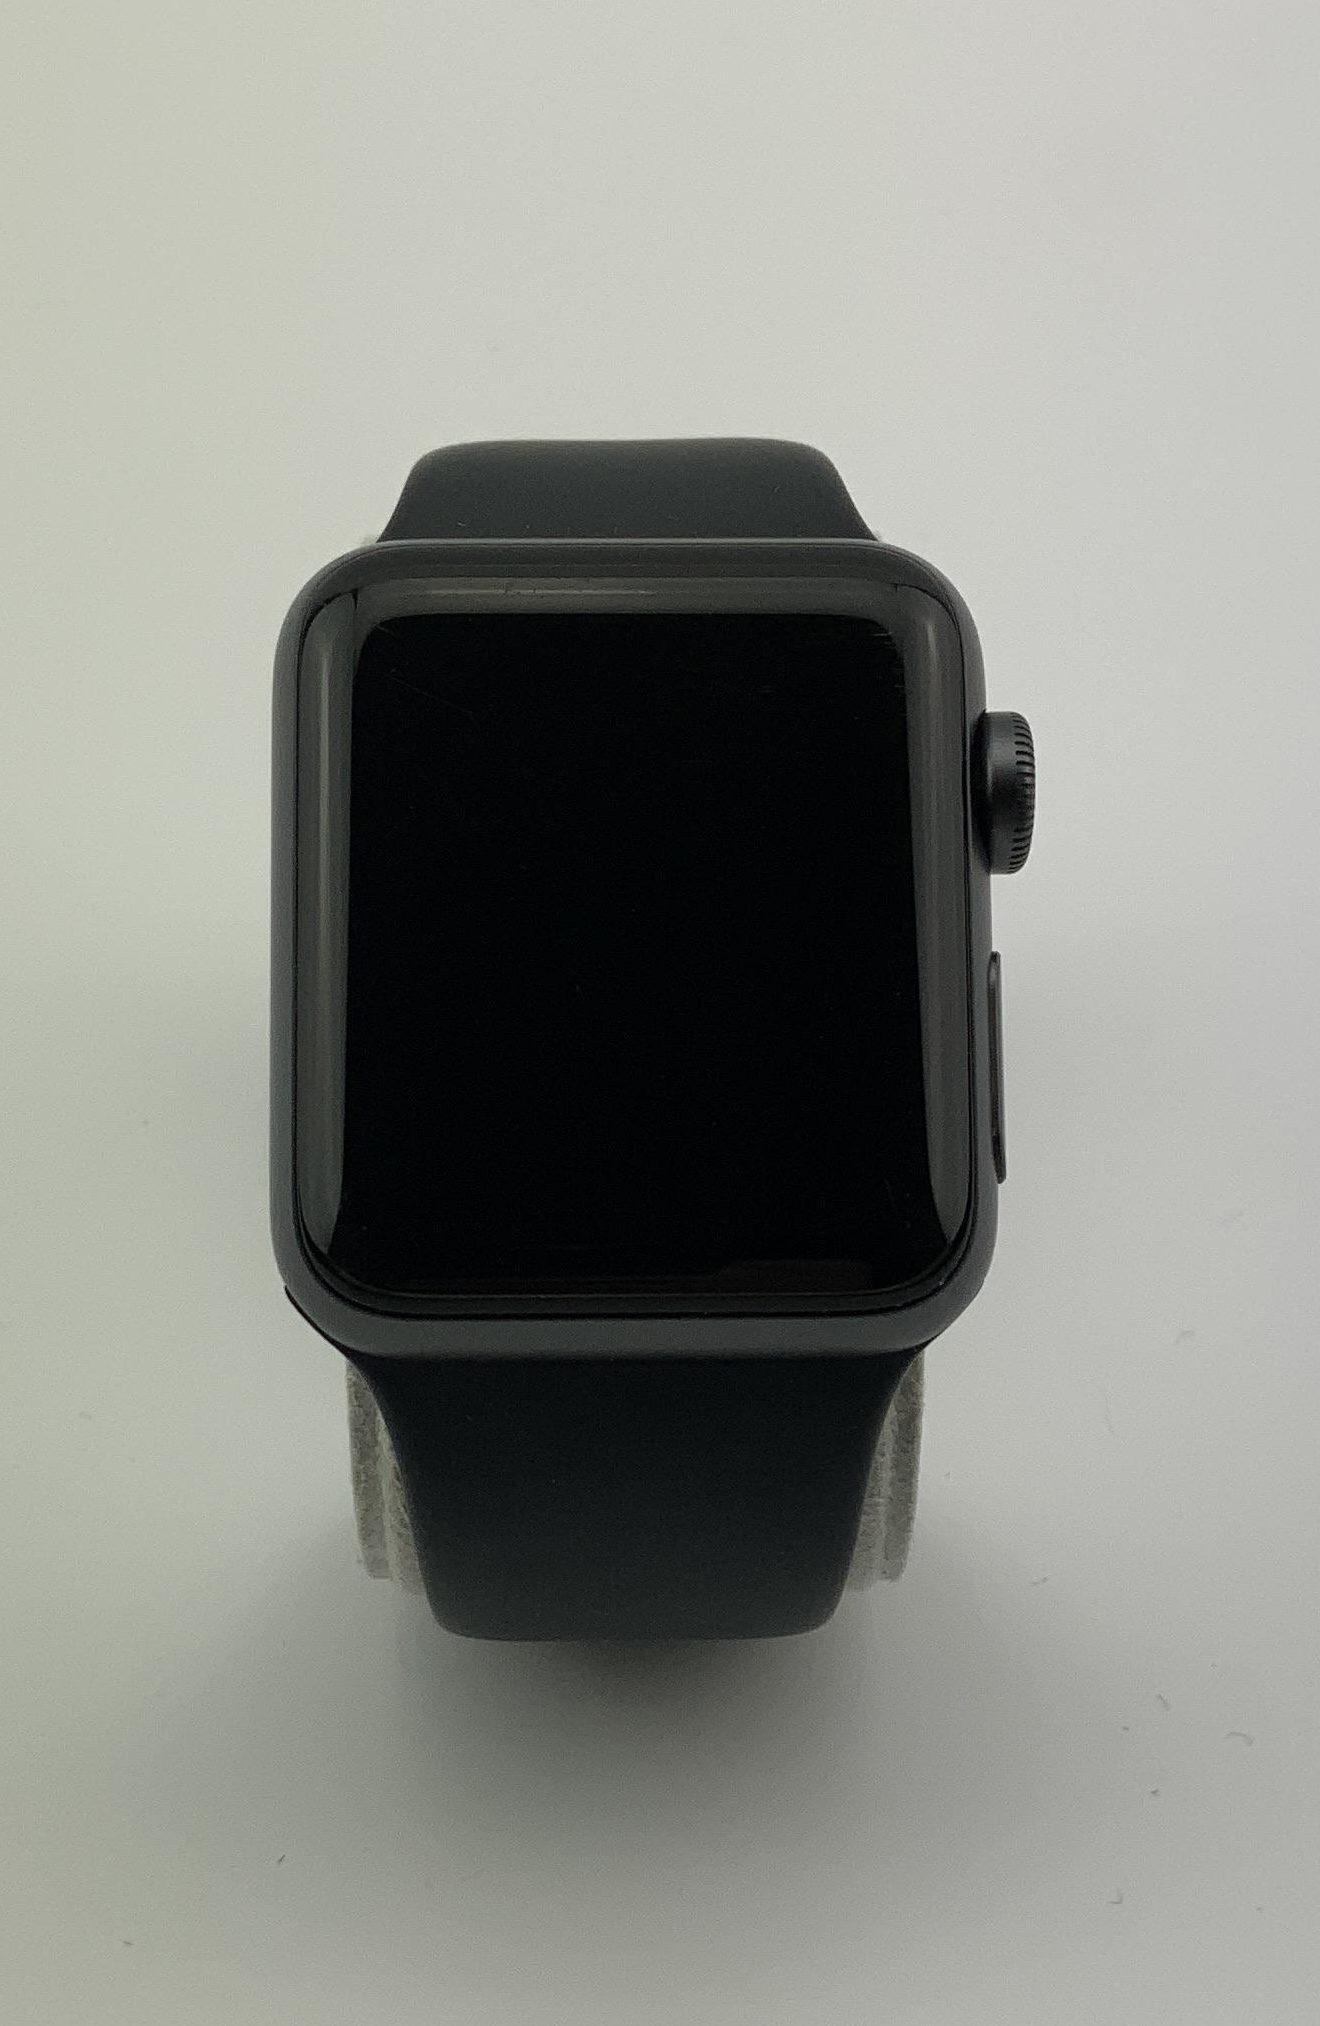 Watch Series 3 Aluminum (38mm), Space Gray, Black Sport Band, imagen 1